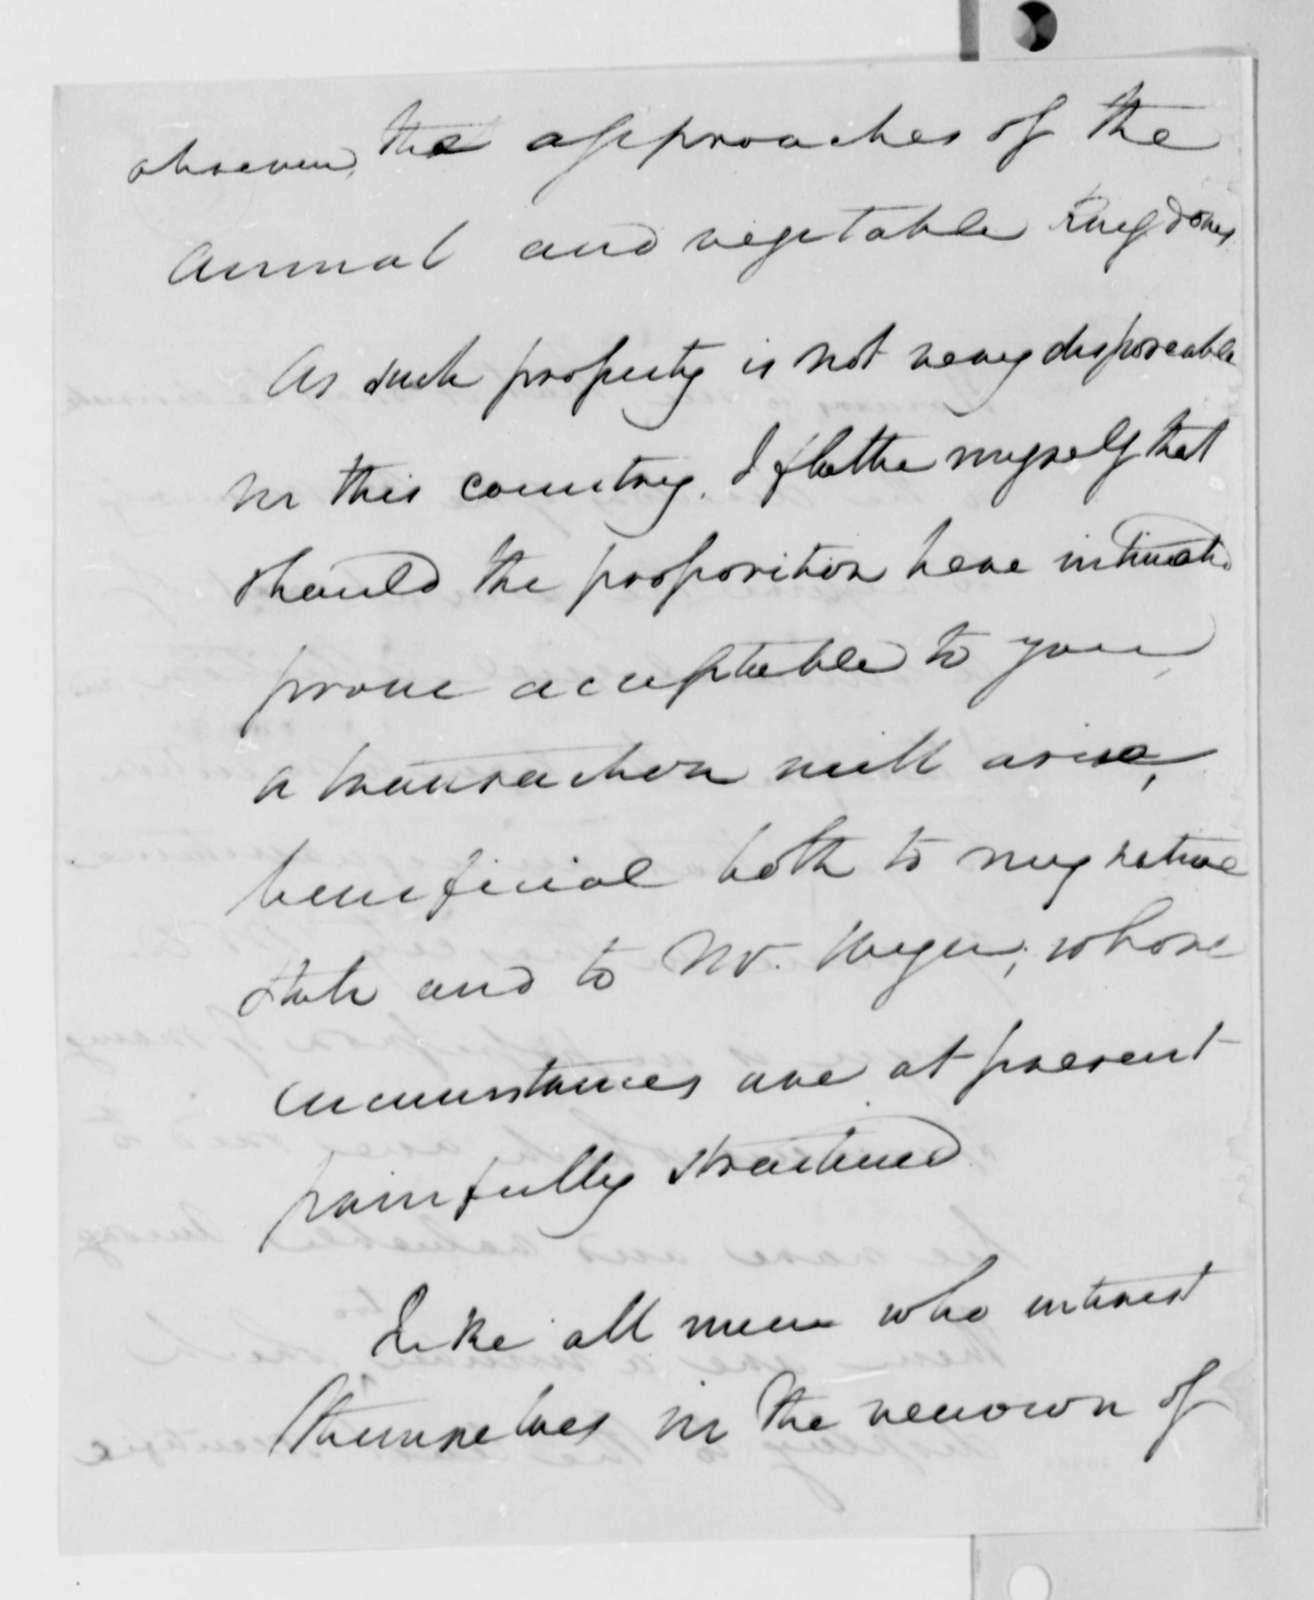 Thomas Jefferson to Henry Lee, Jr., April 29, 1825